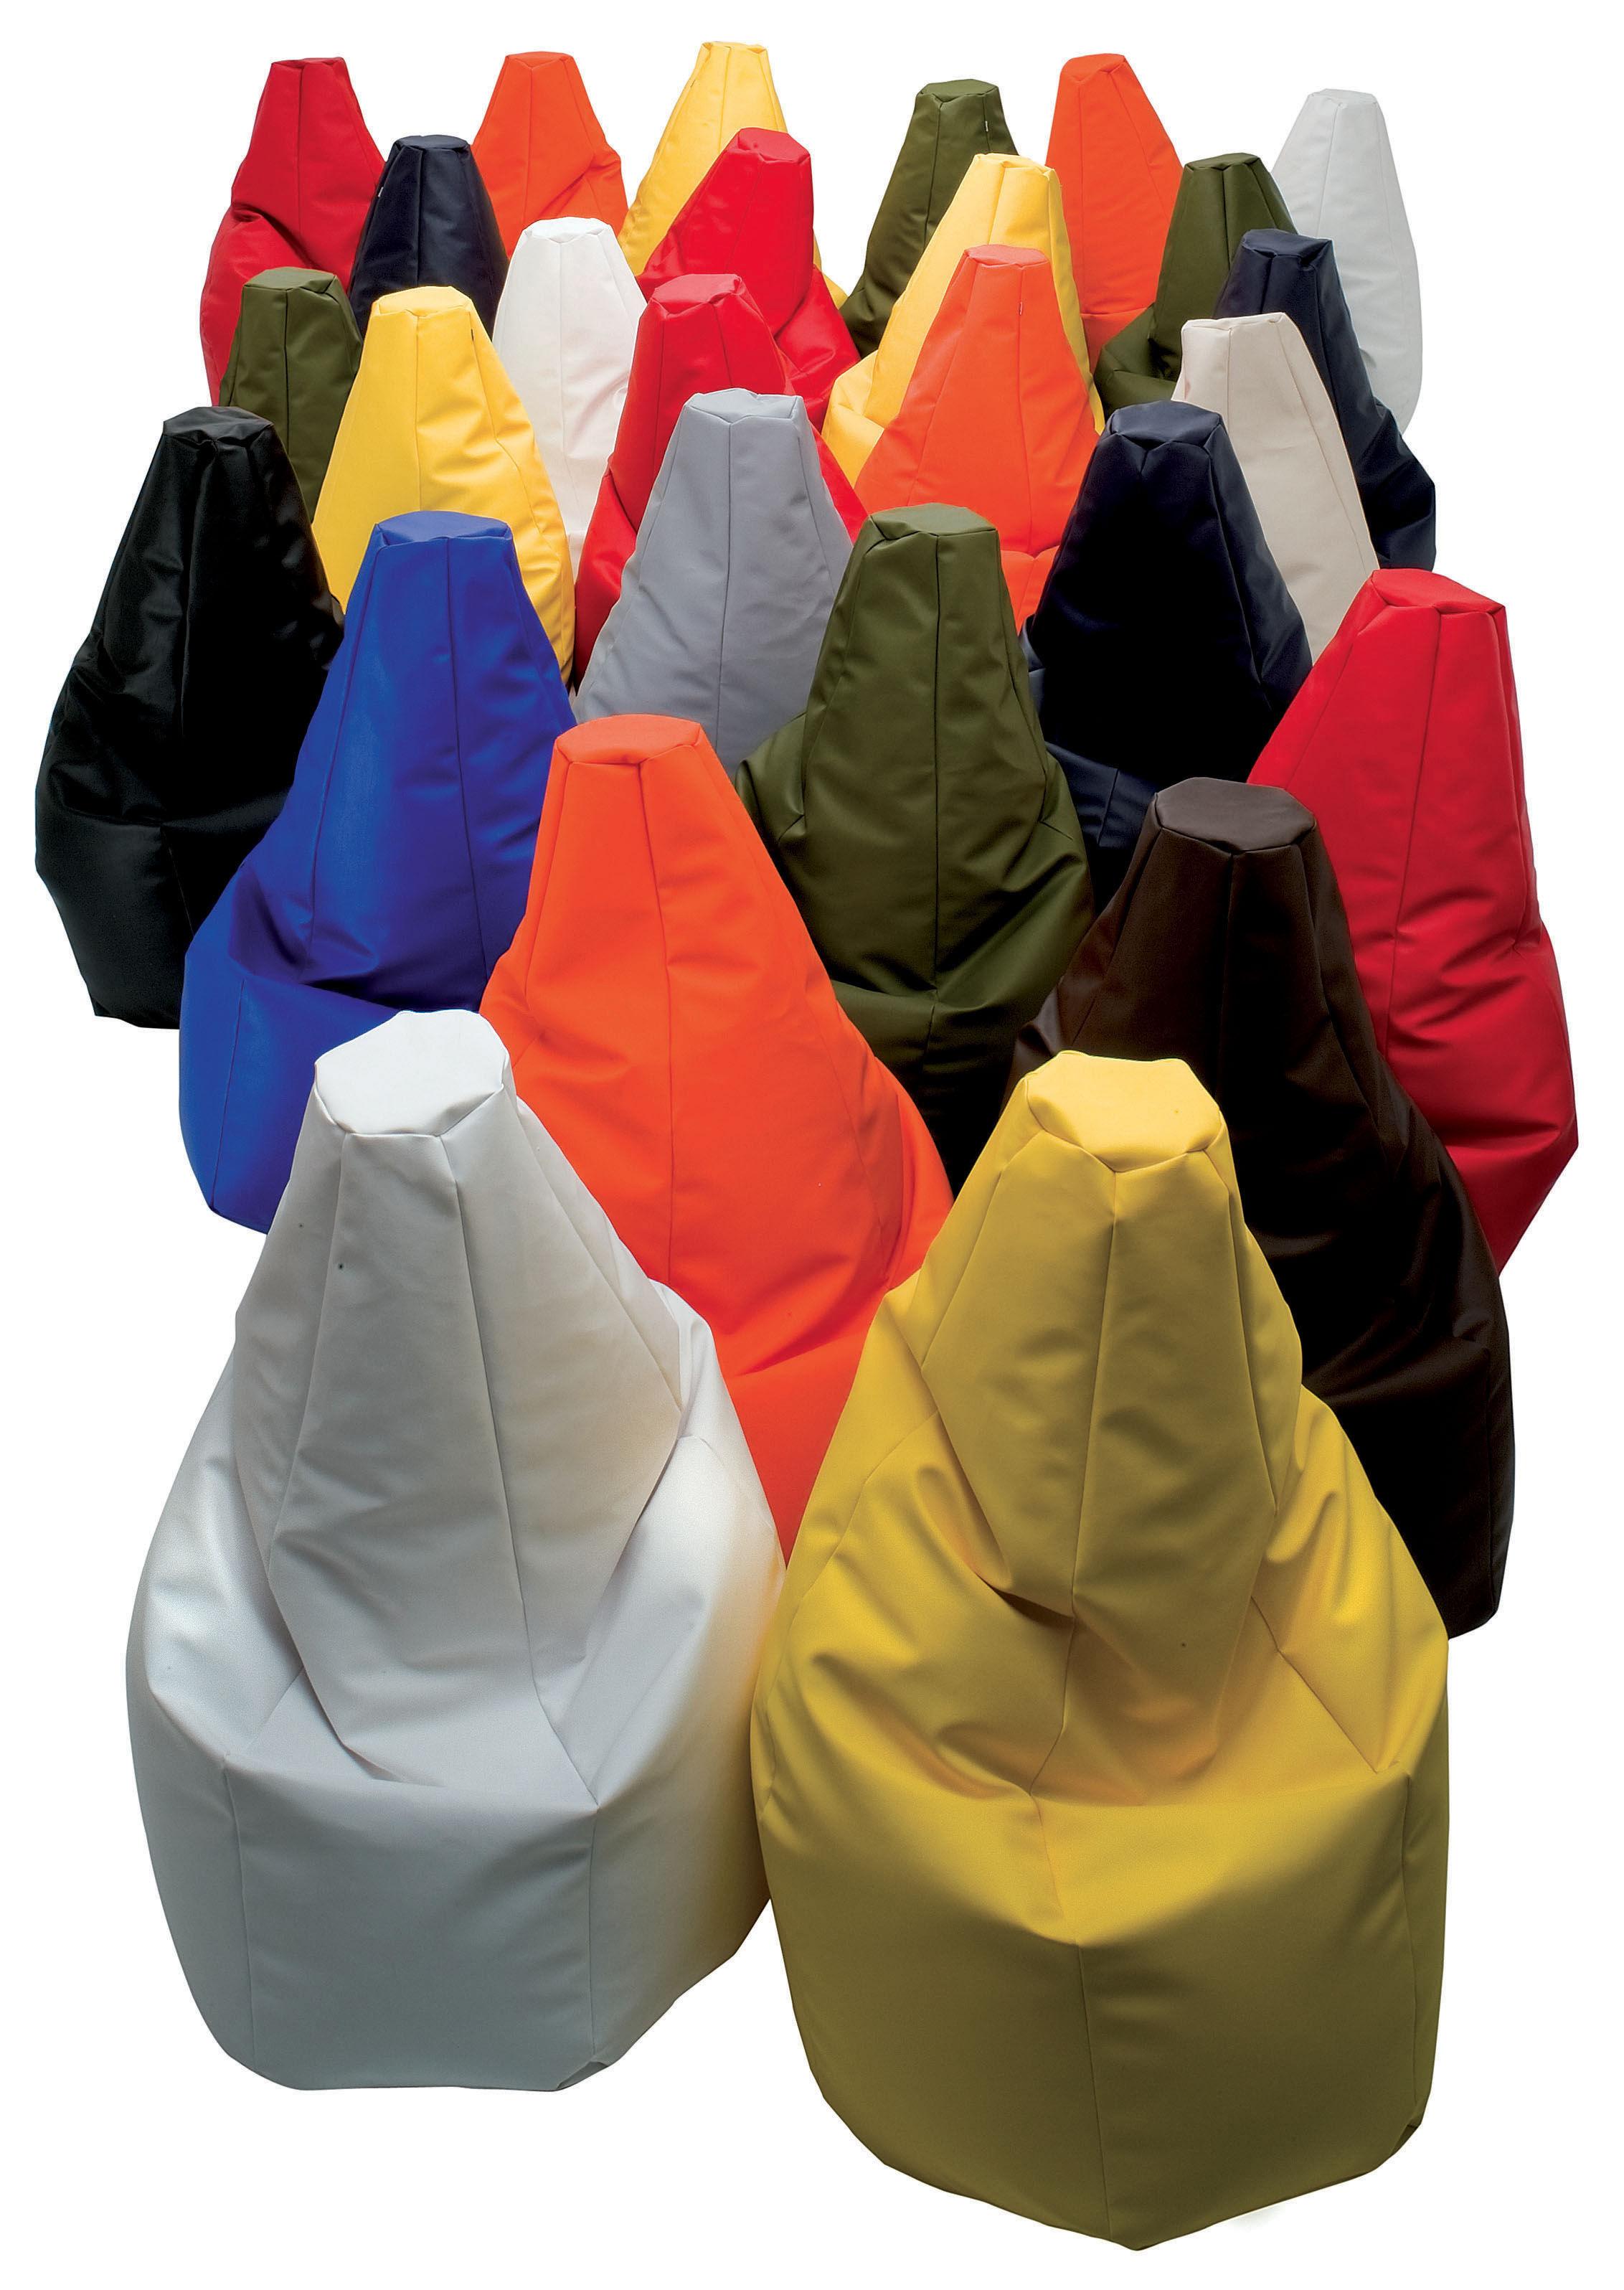 Pouf Zanotta.Zanotta Sacco Sneak Peek Of 10 Designs Shortlisted For Sacco Bean